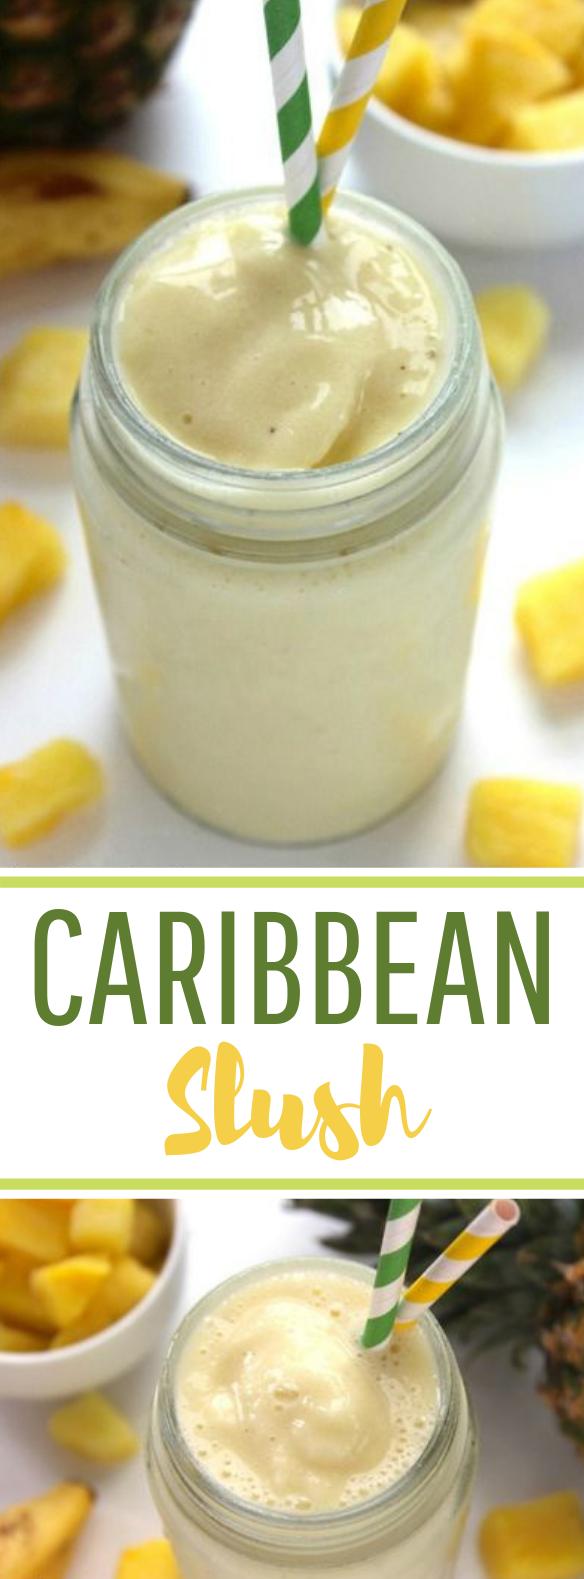 Caribbean Slush #summer #freshdrink